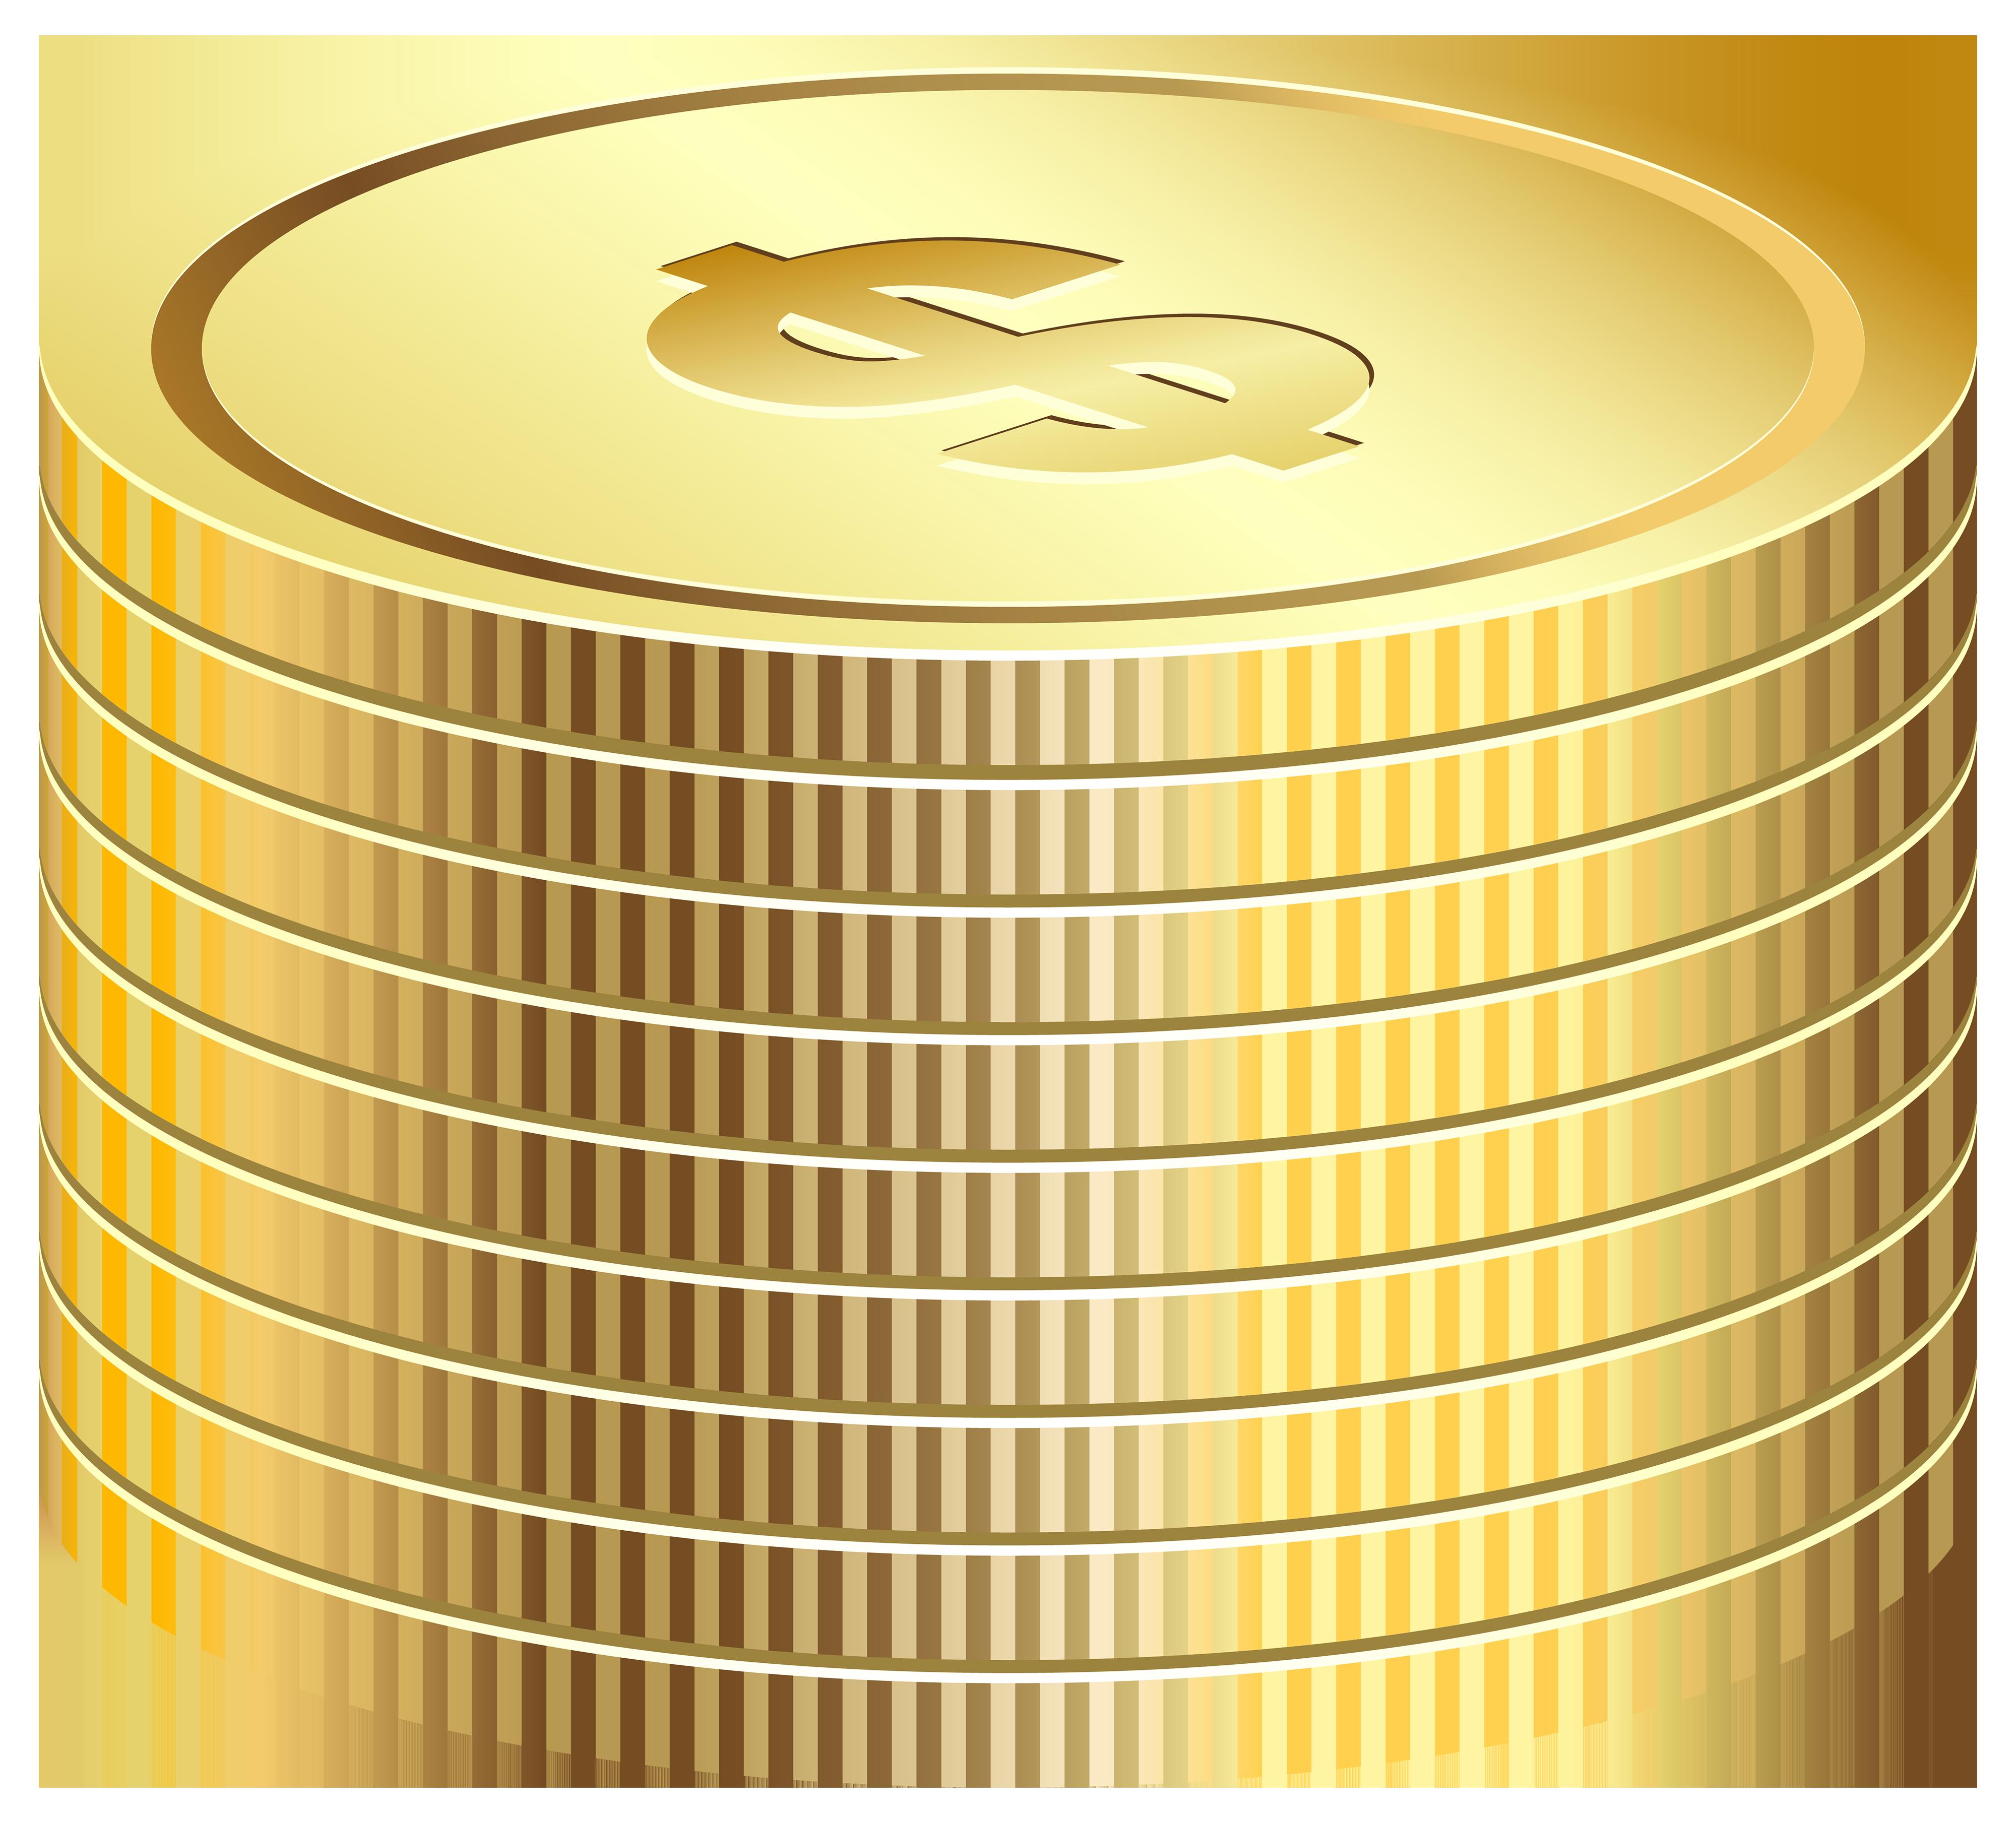 Hanukkah clipart coin. Coins png best web